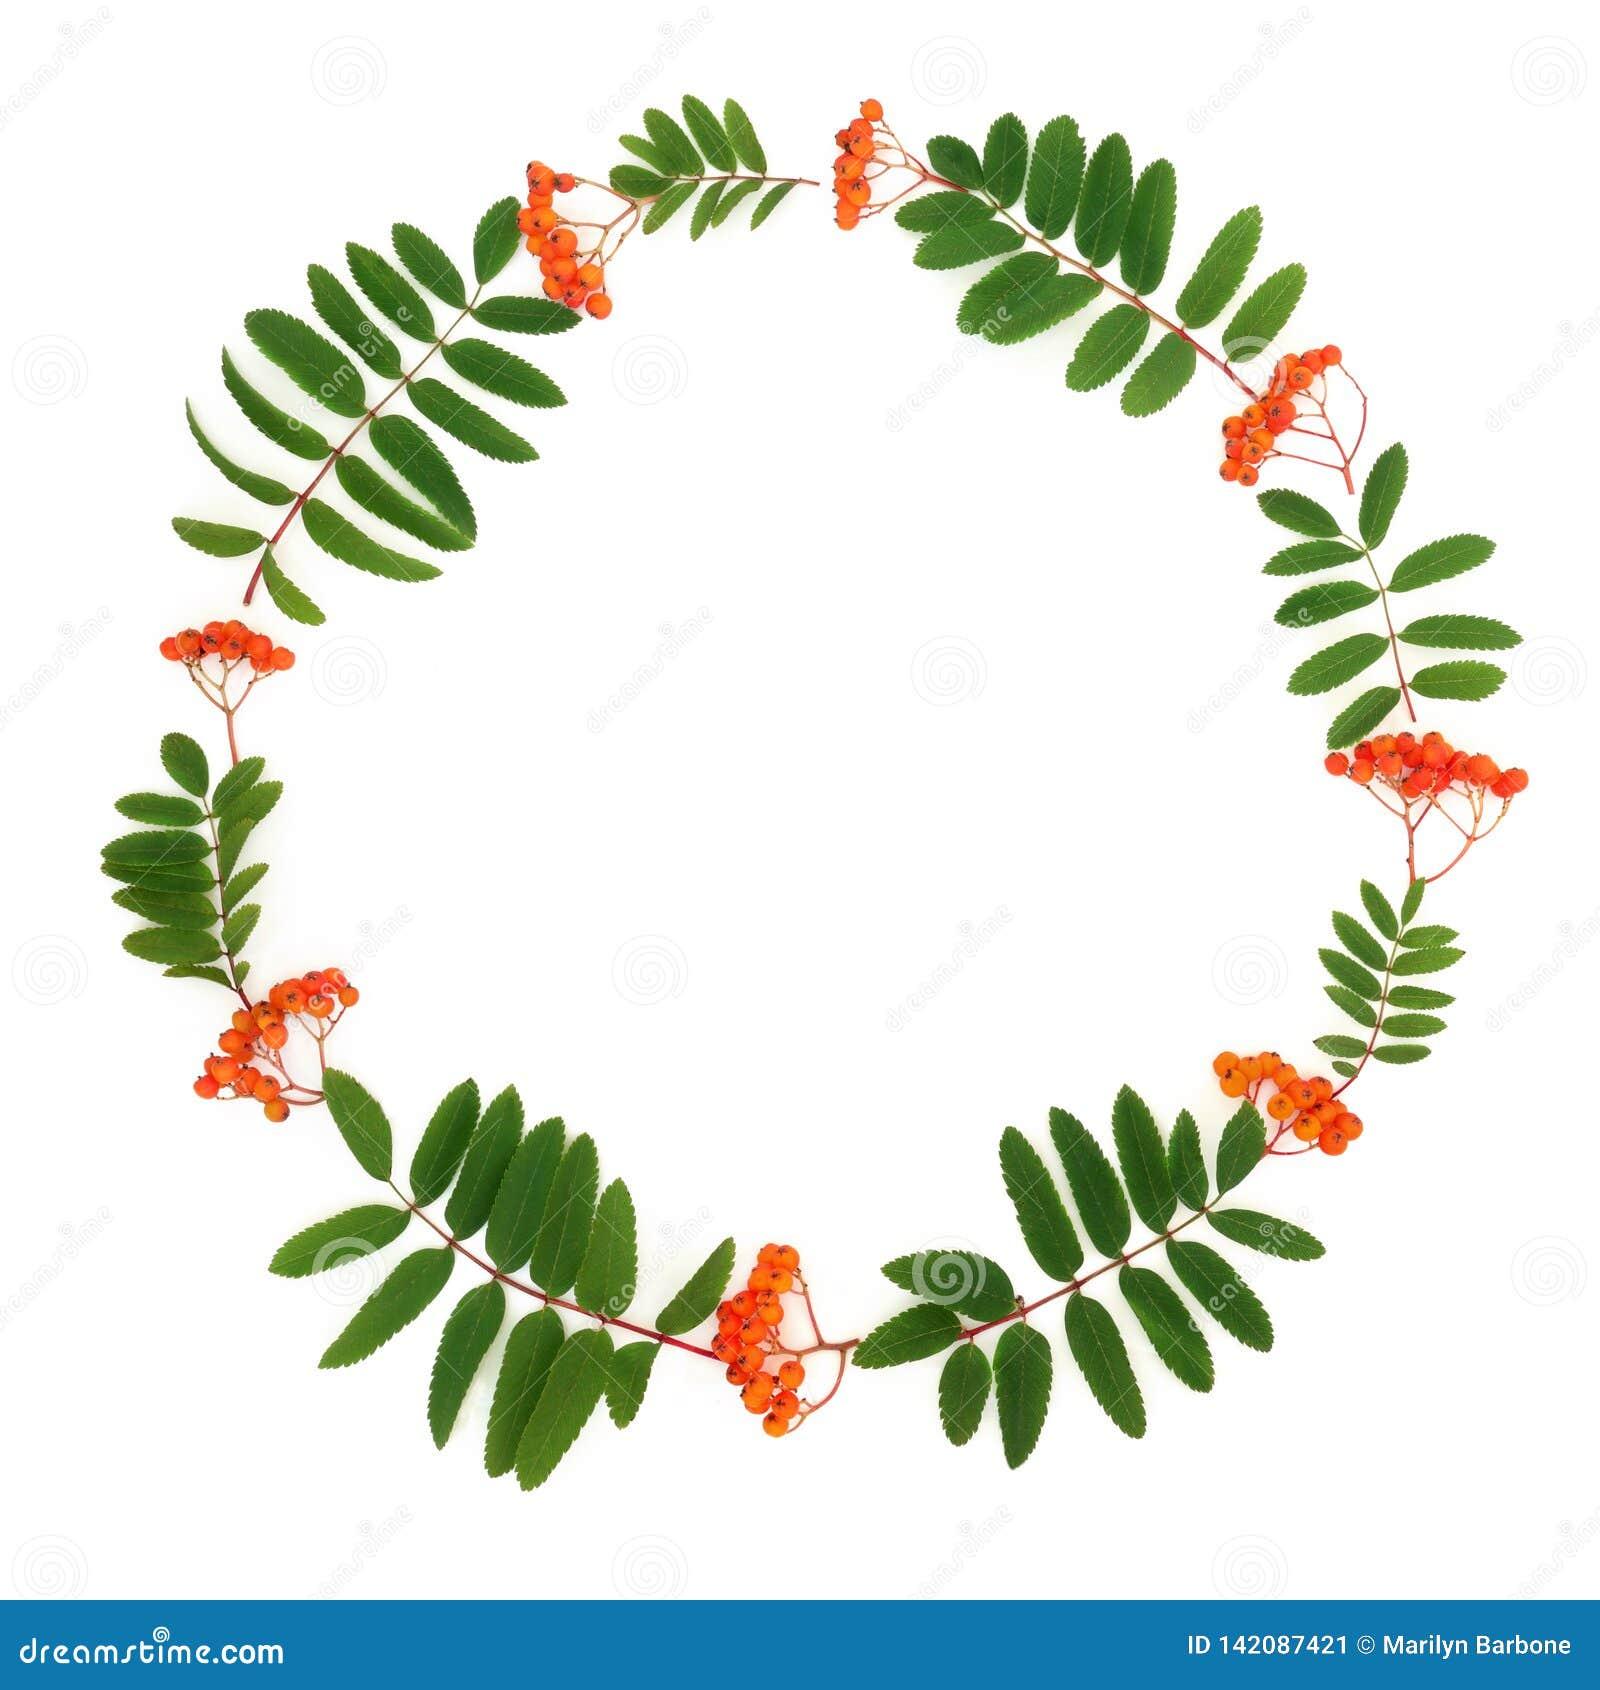 Rowan Ash Berry Wreath